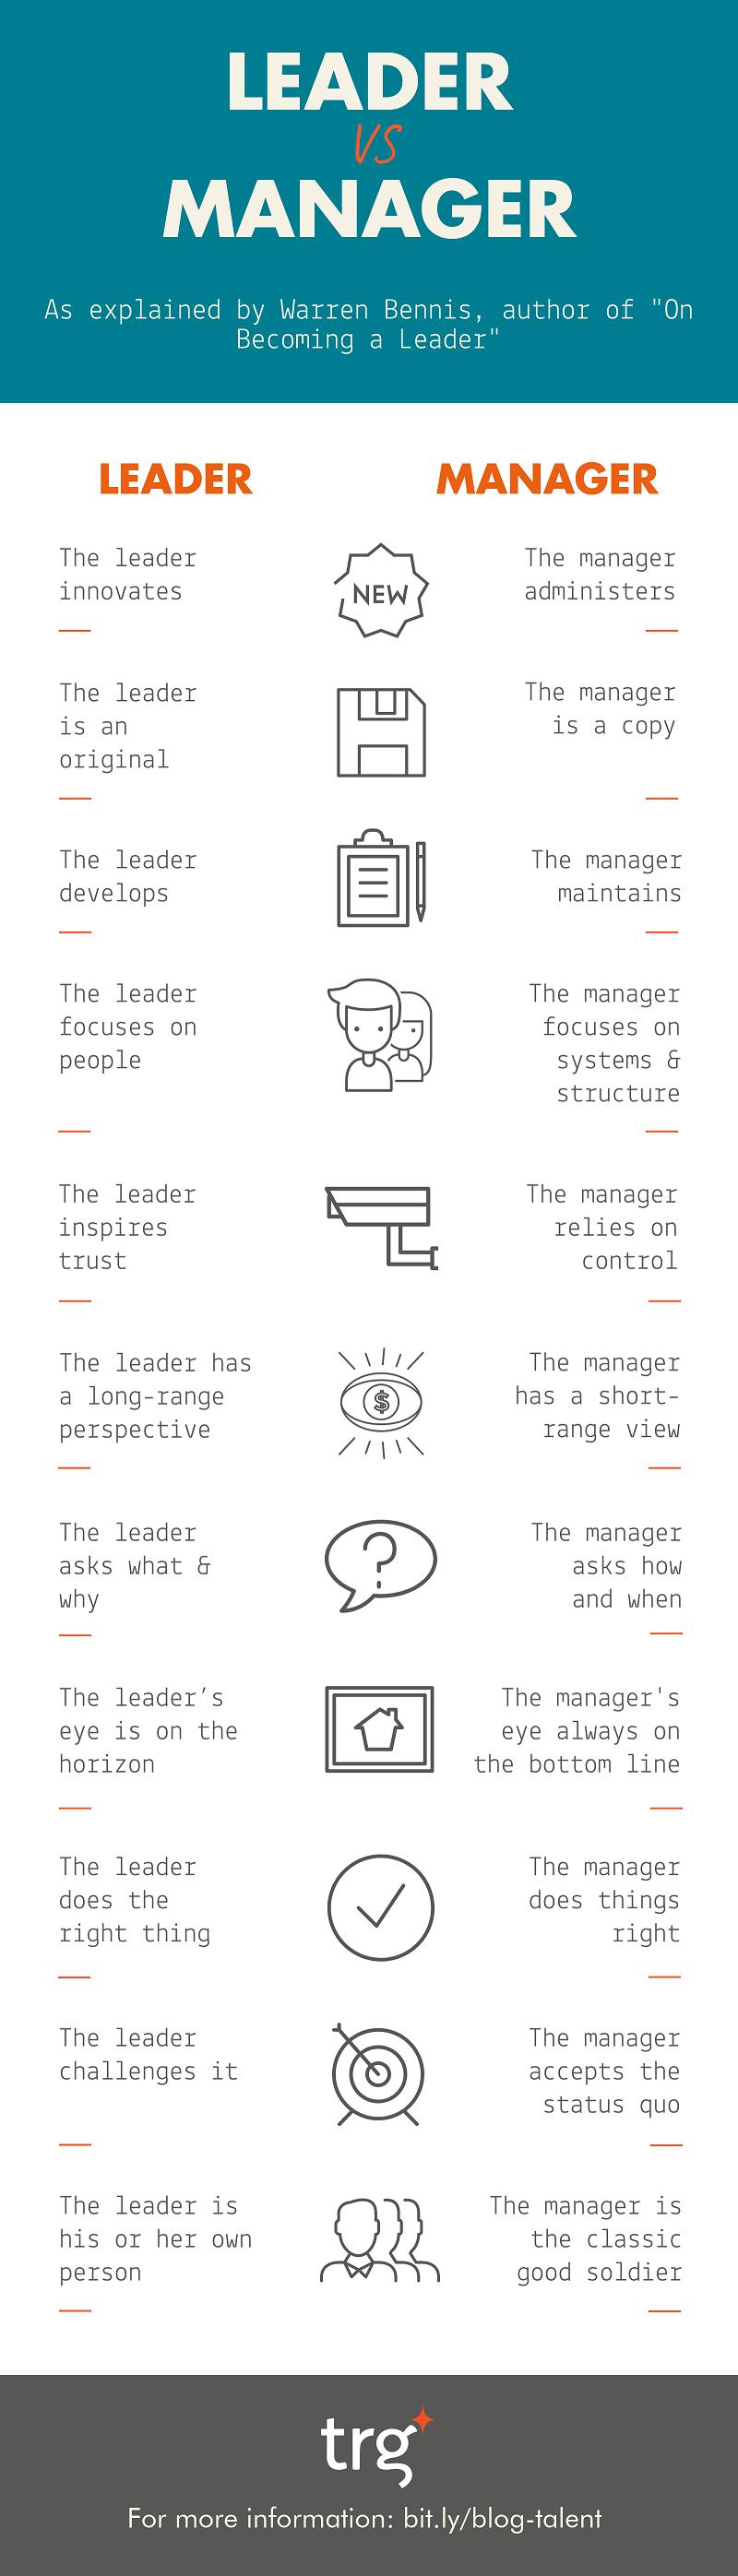 Infographic - Leader vs Manager